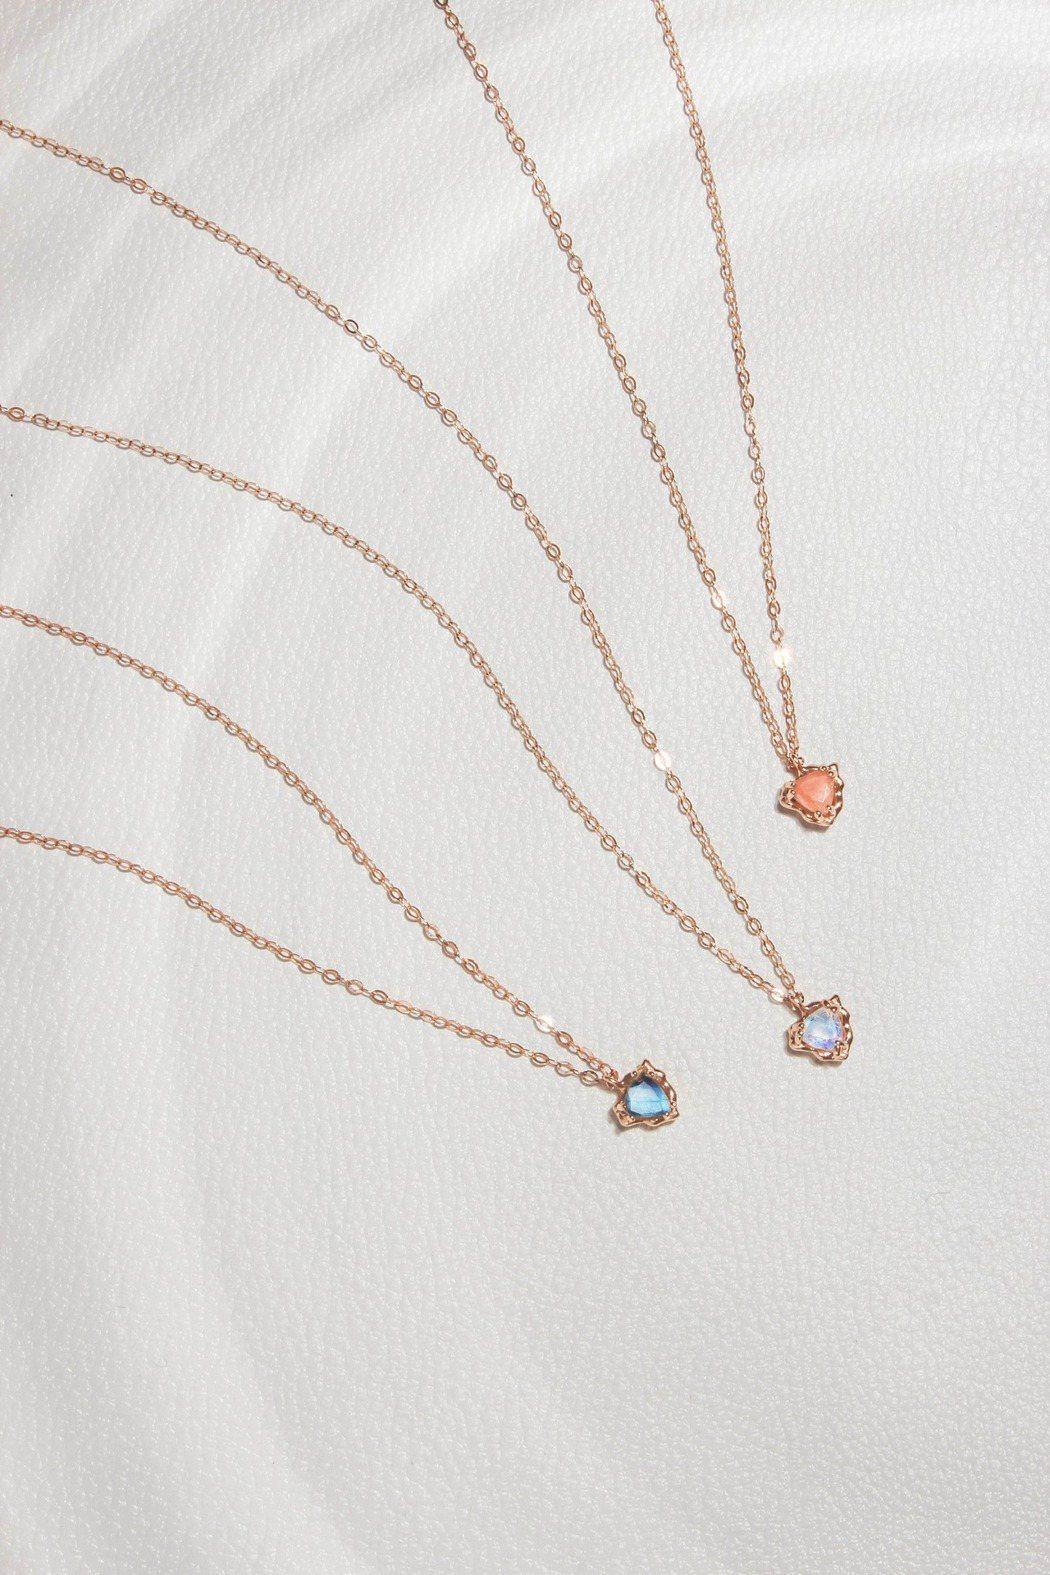 Silver Twinkle 14K金華麗三角蜜桃月光石、彩虹月光石、拉長石項鍊...